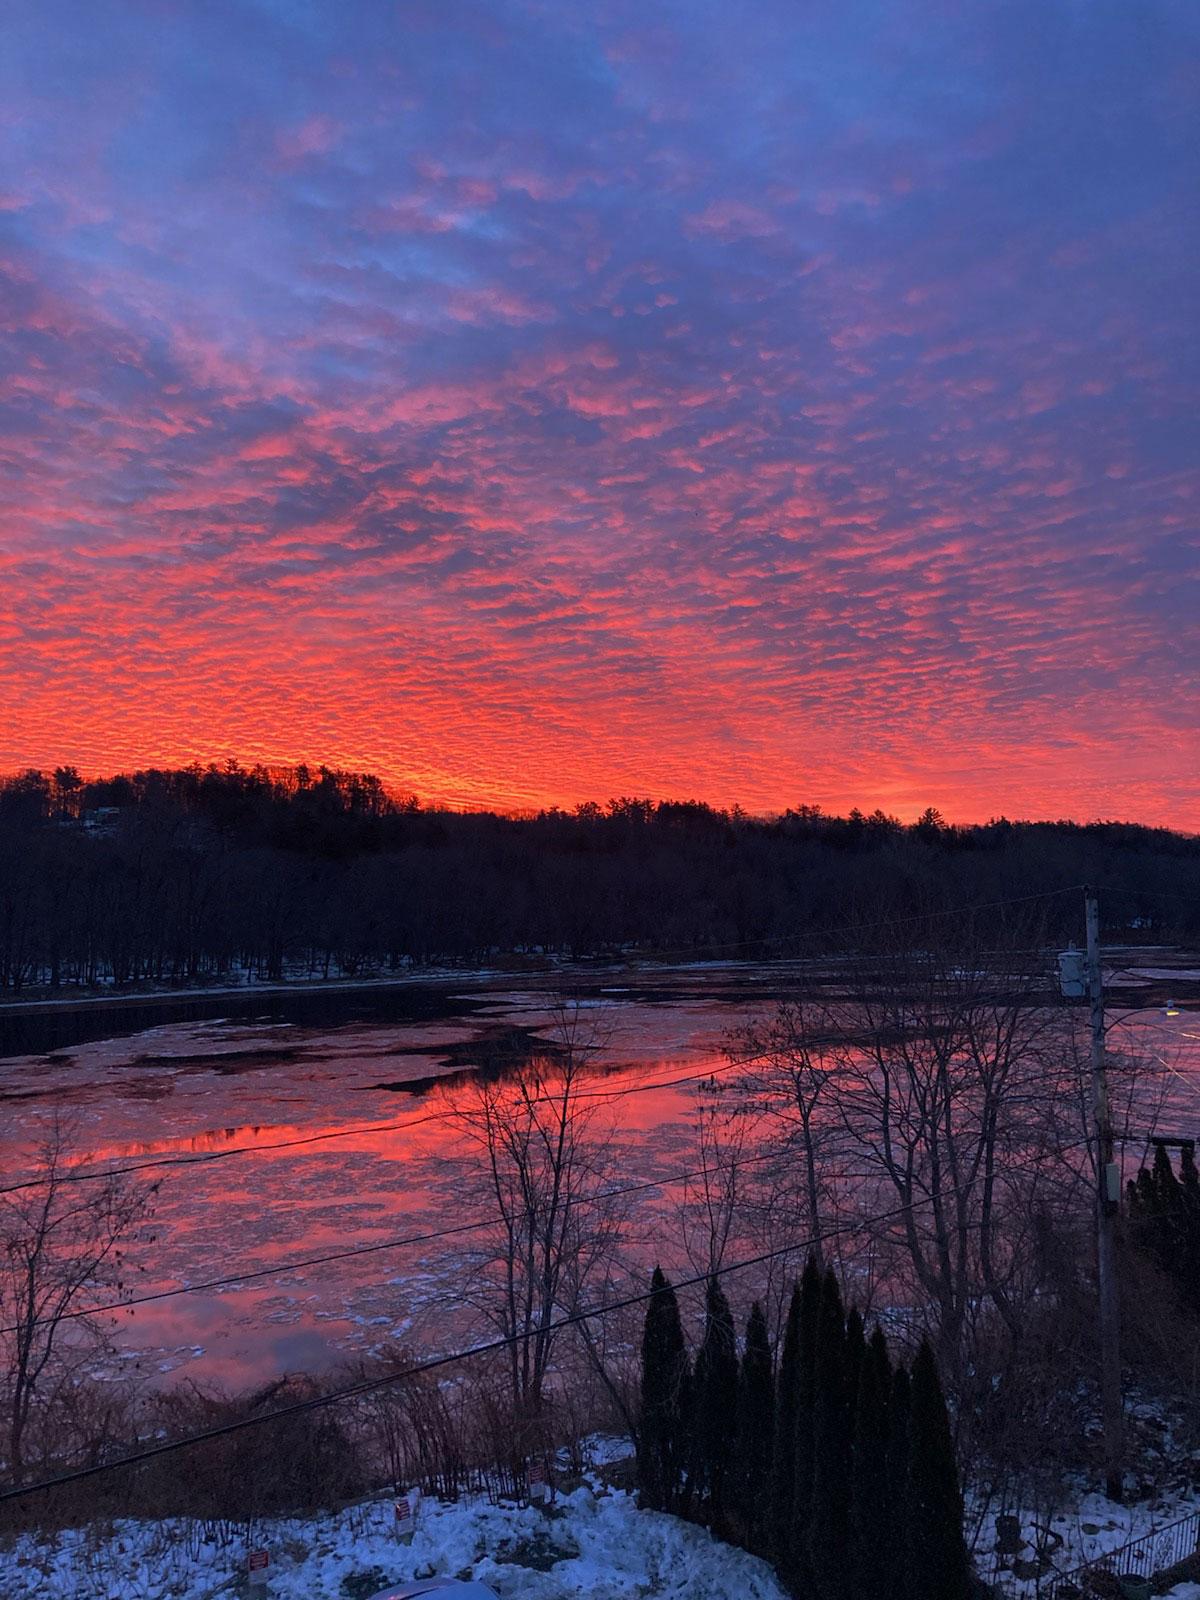 Sunrise over Kennebec River